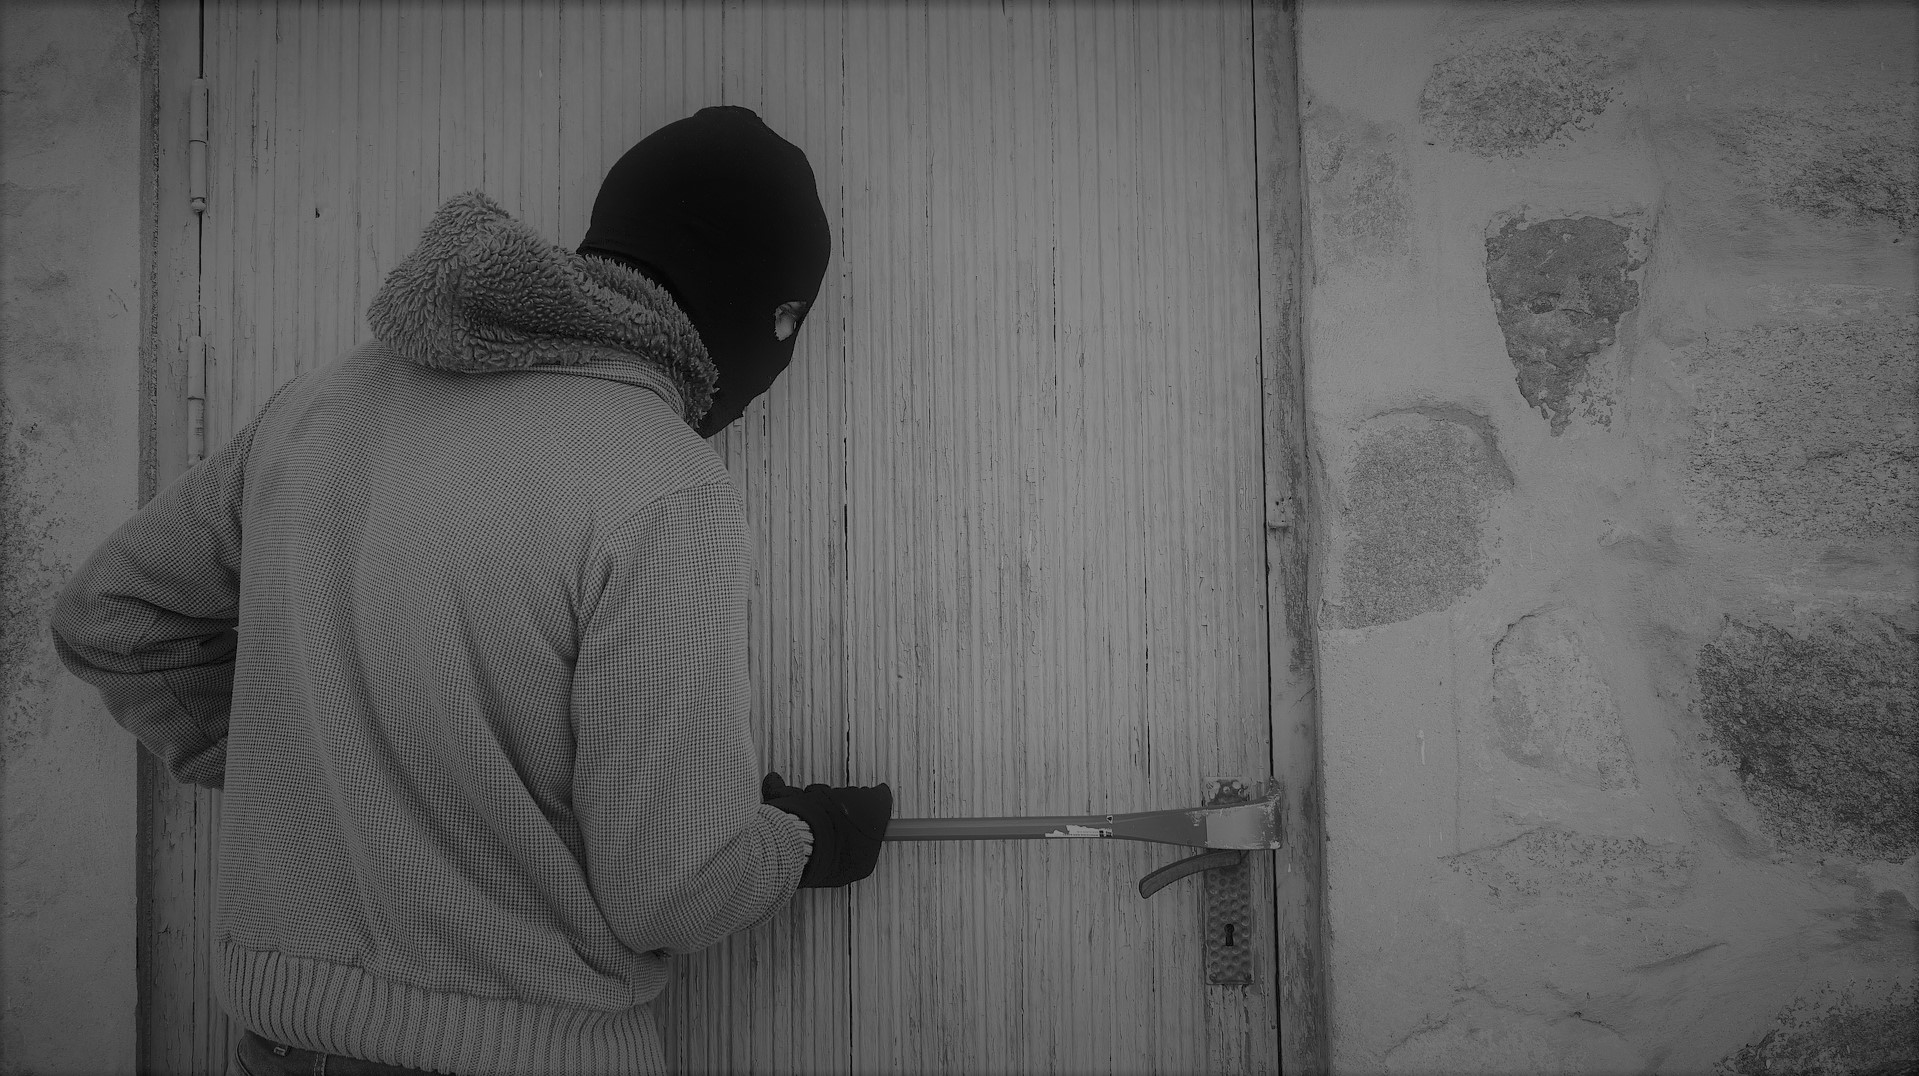 Thief, crime, burglar, door, black, mask